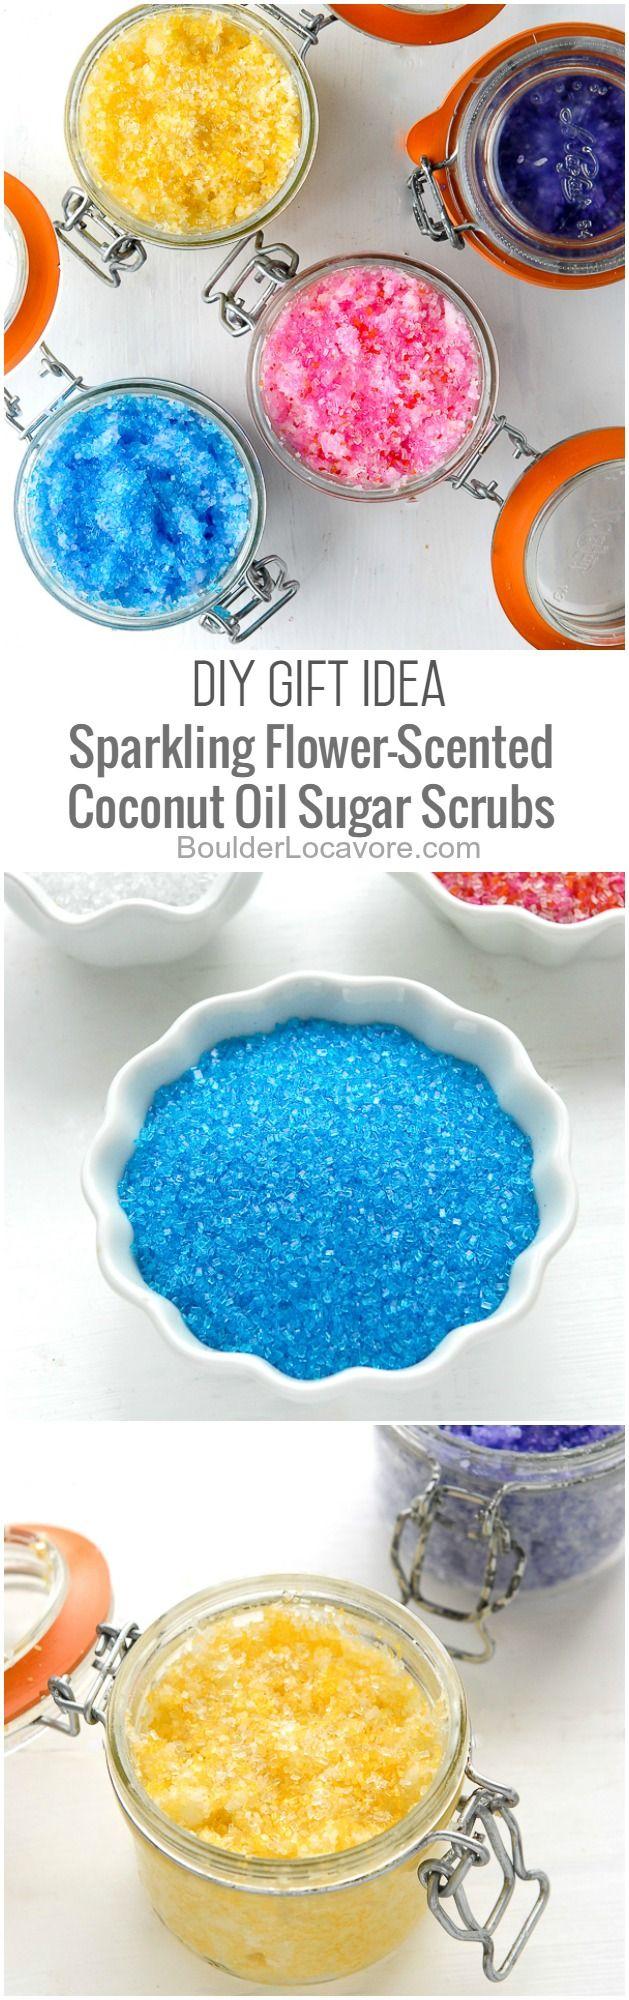 DIY Gift Idea: Sparkling Flower-Scented Coconut Oil Sugar Scrubs | Boulder Locavore